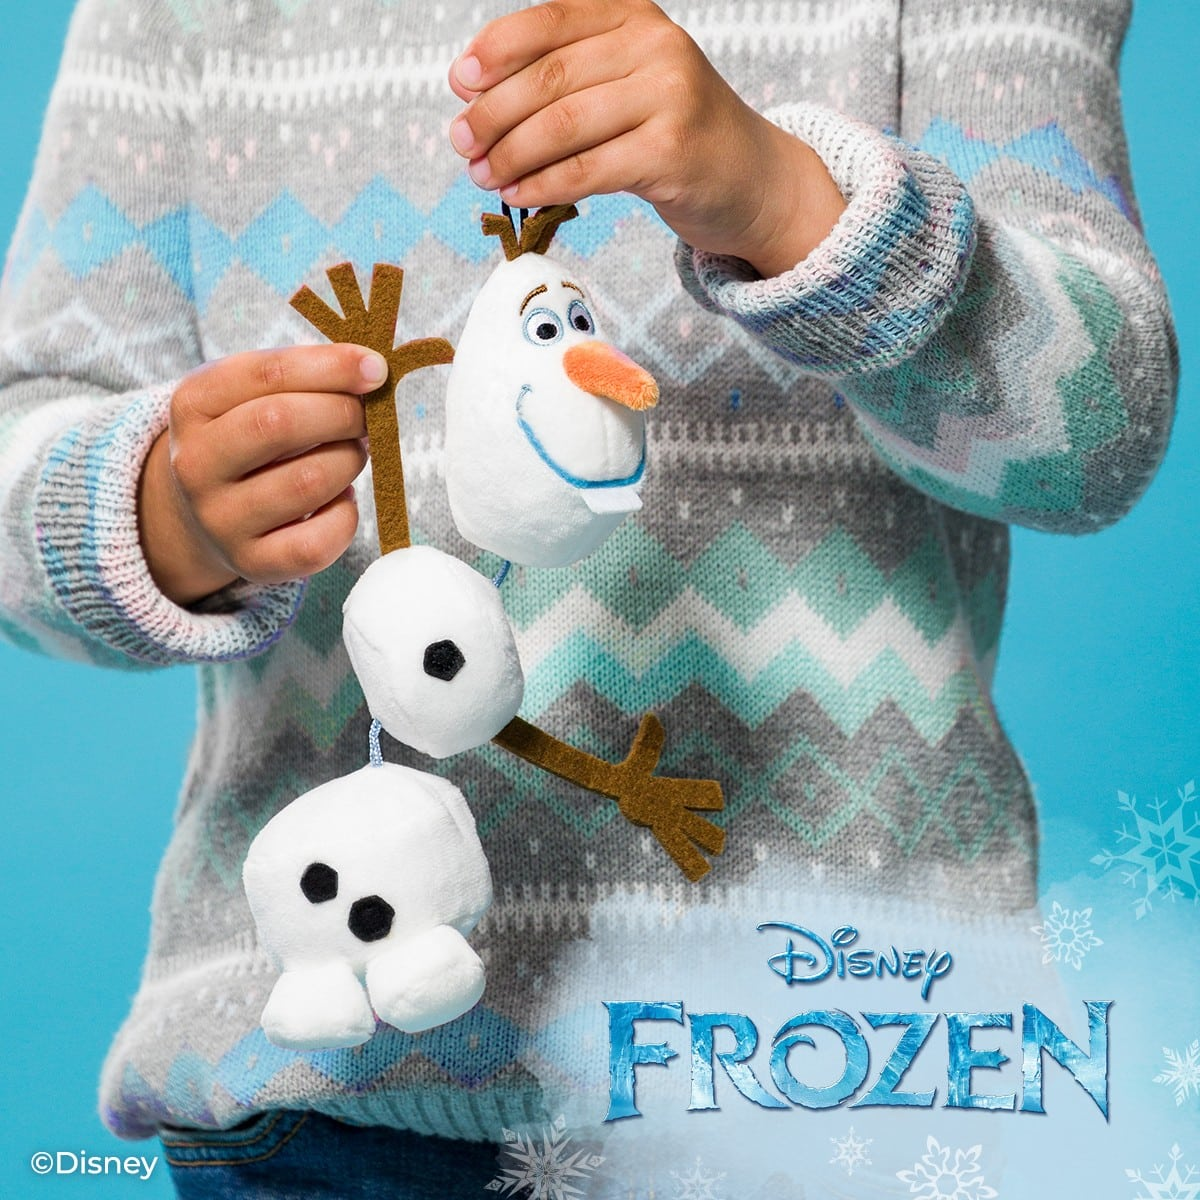 Frozen Olaf Scentsy Buddy Clip1   DISNEY: FROZEN - SCENTSY PRODUCTS   SVEN SCENTSY BUDDY & SCENT   SHOP NOW